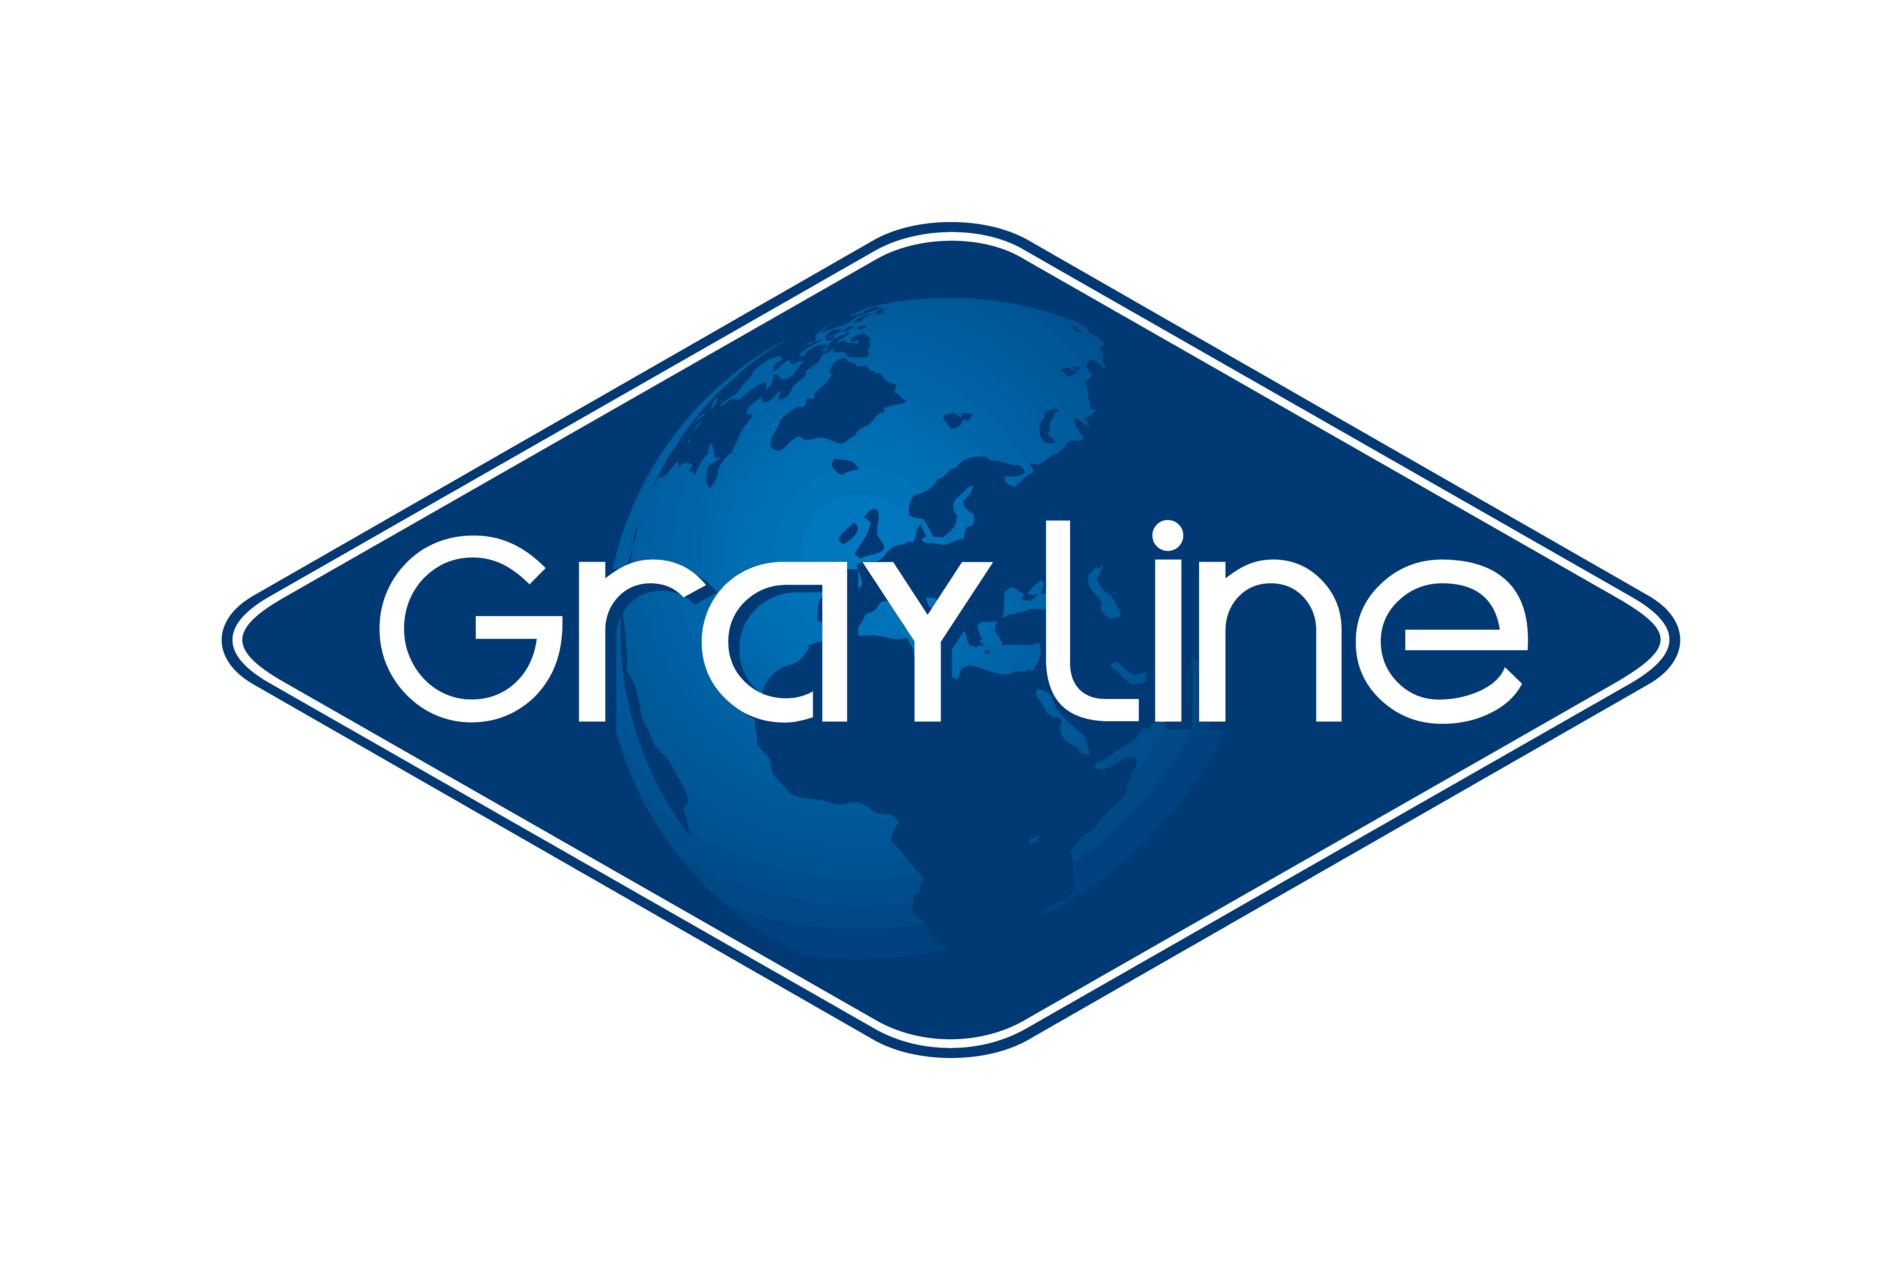 GrayLine_Border_Thin_Curved